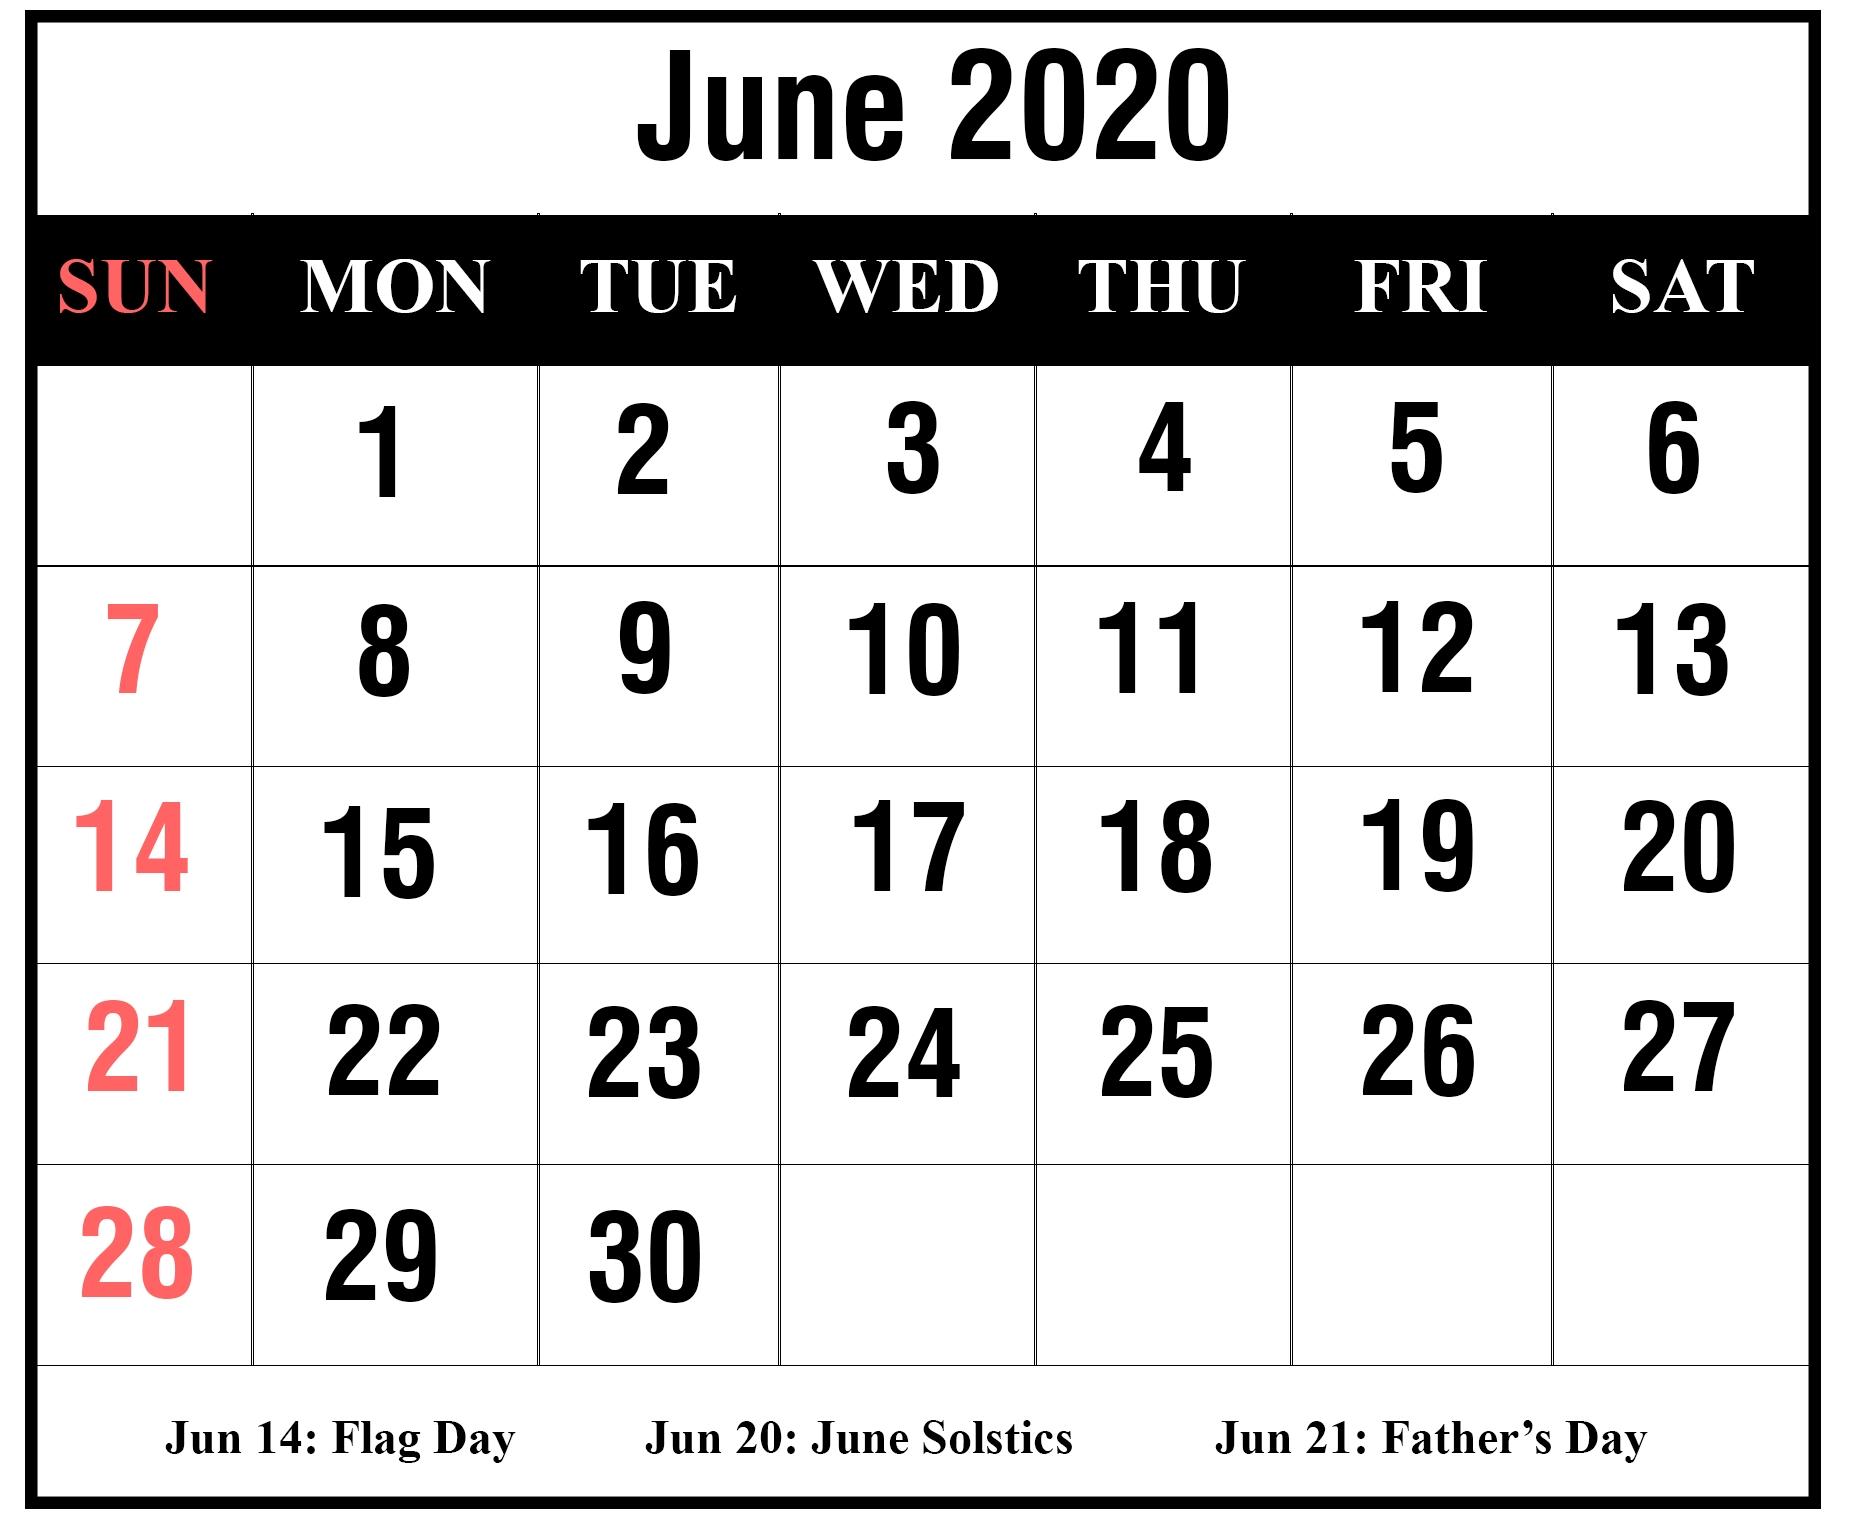 Free Printable June 2020 Calendar Templates [Pdf,word,excel with regard to National Day Calendar 2020 Printable